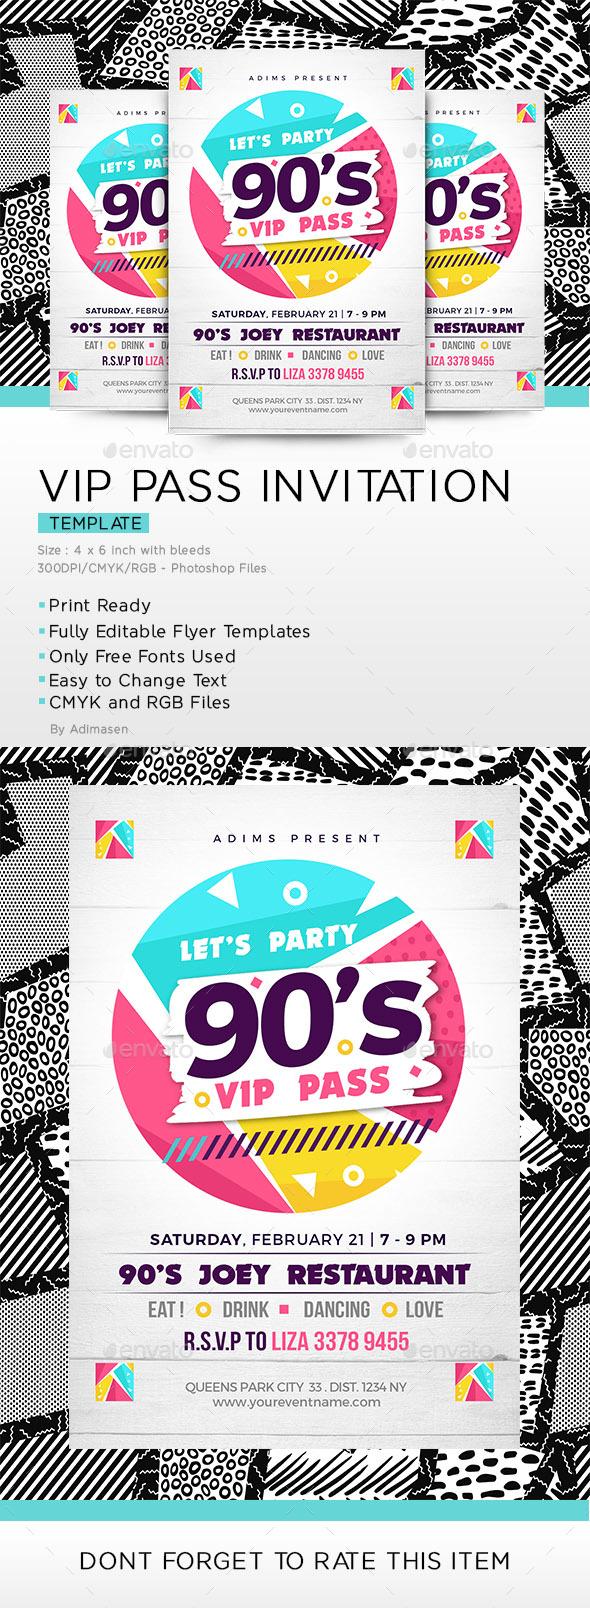 90's party VIP pass Invitation - Invitations Cards & Invites